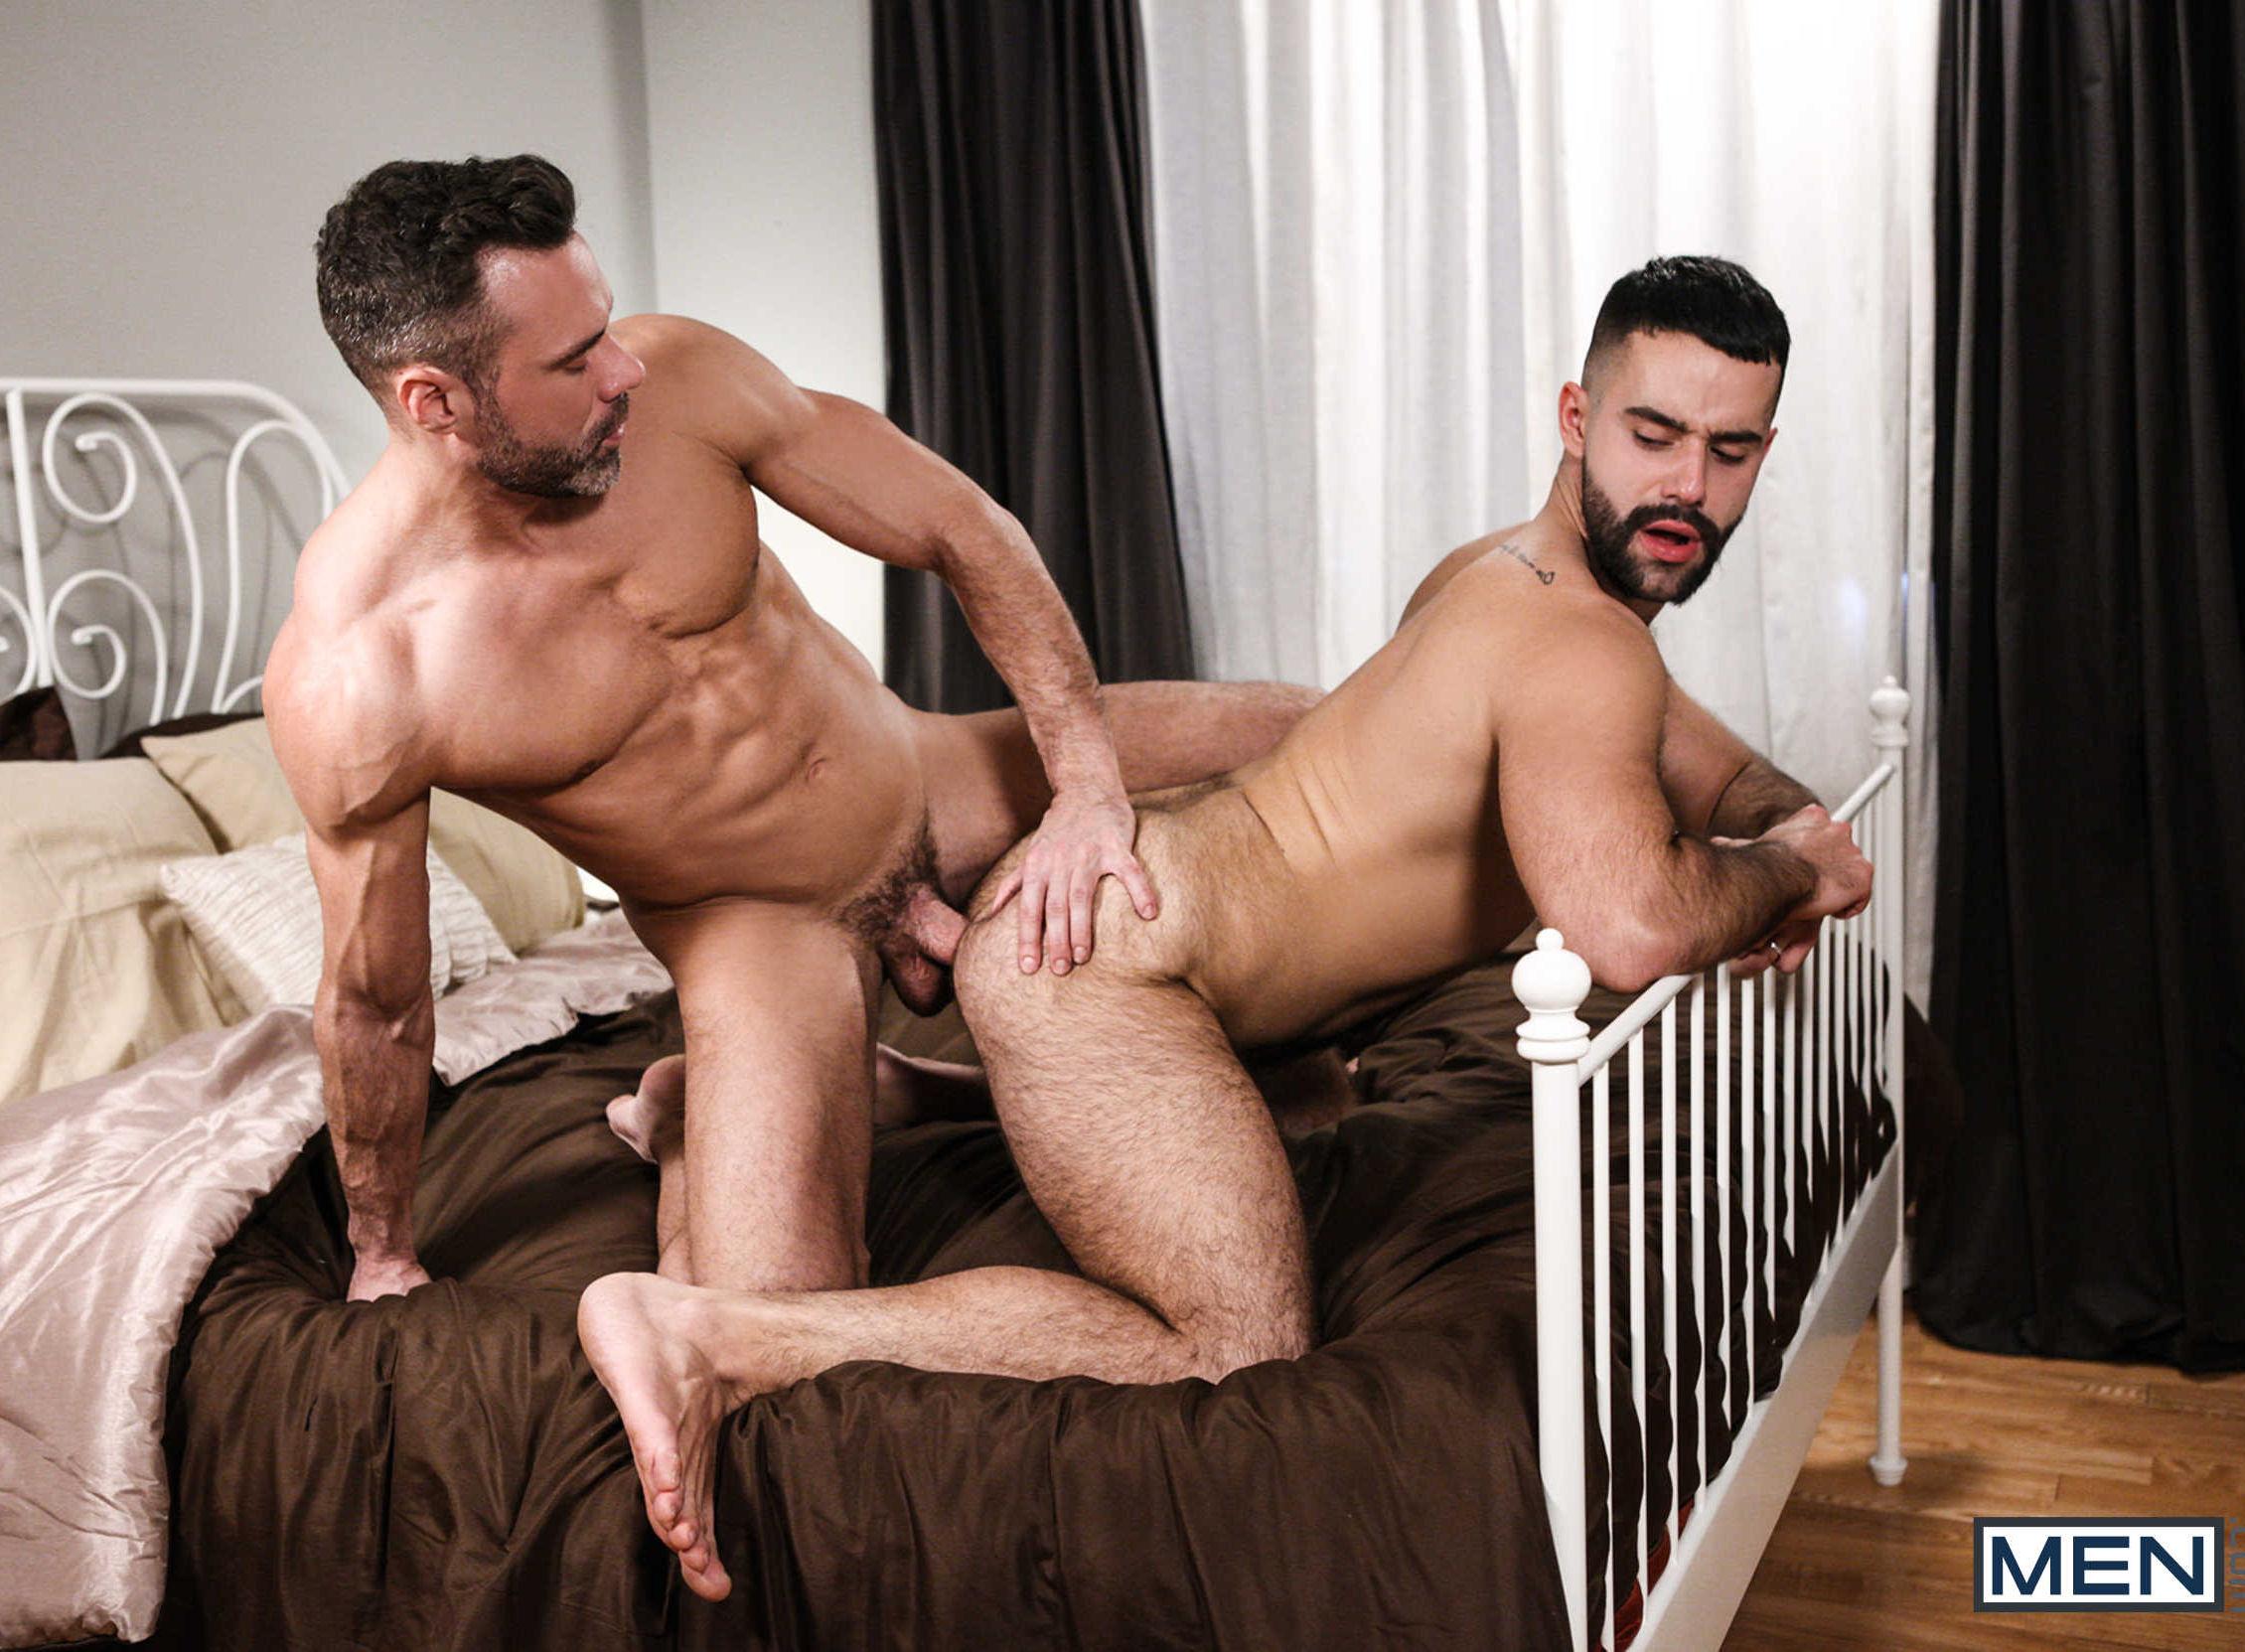 MEN – Manuel Skye, Teddy Torres – Undercover Stripper Part 3